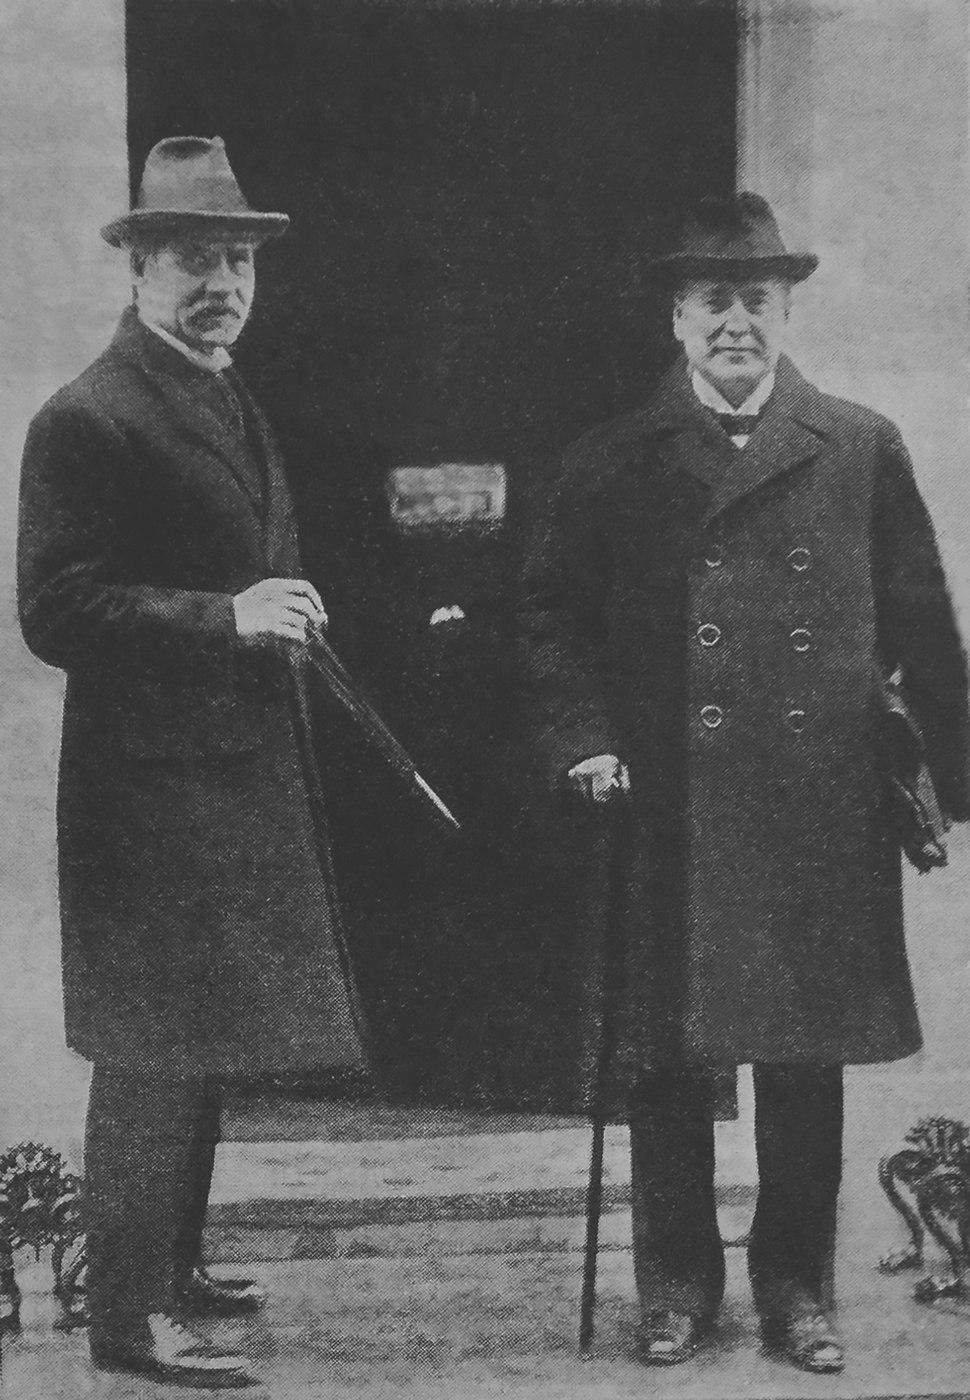 Ramsay MacDonald Christian Rakovsky 1924